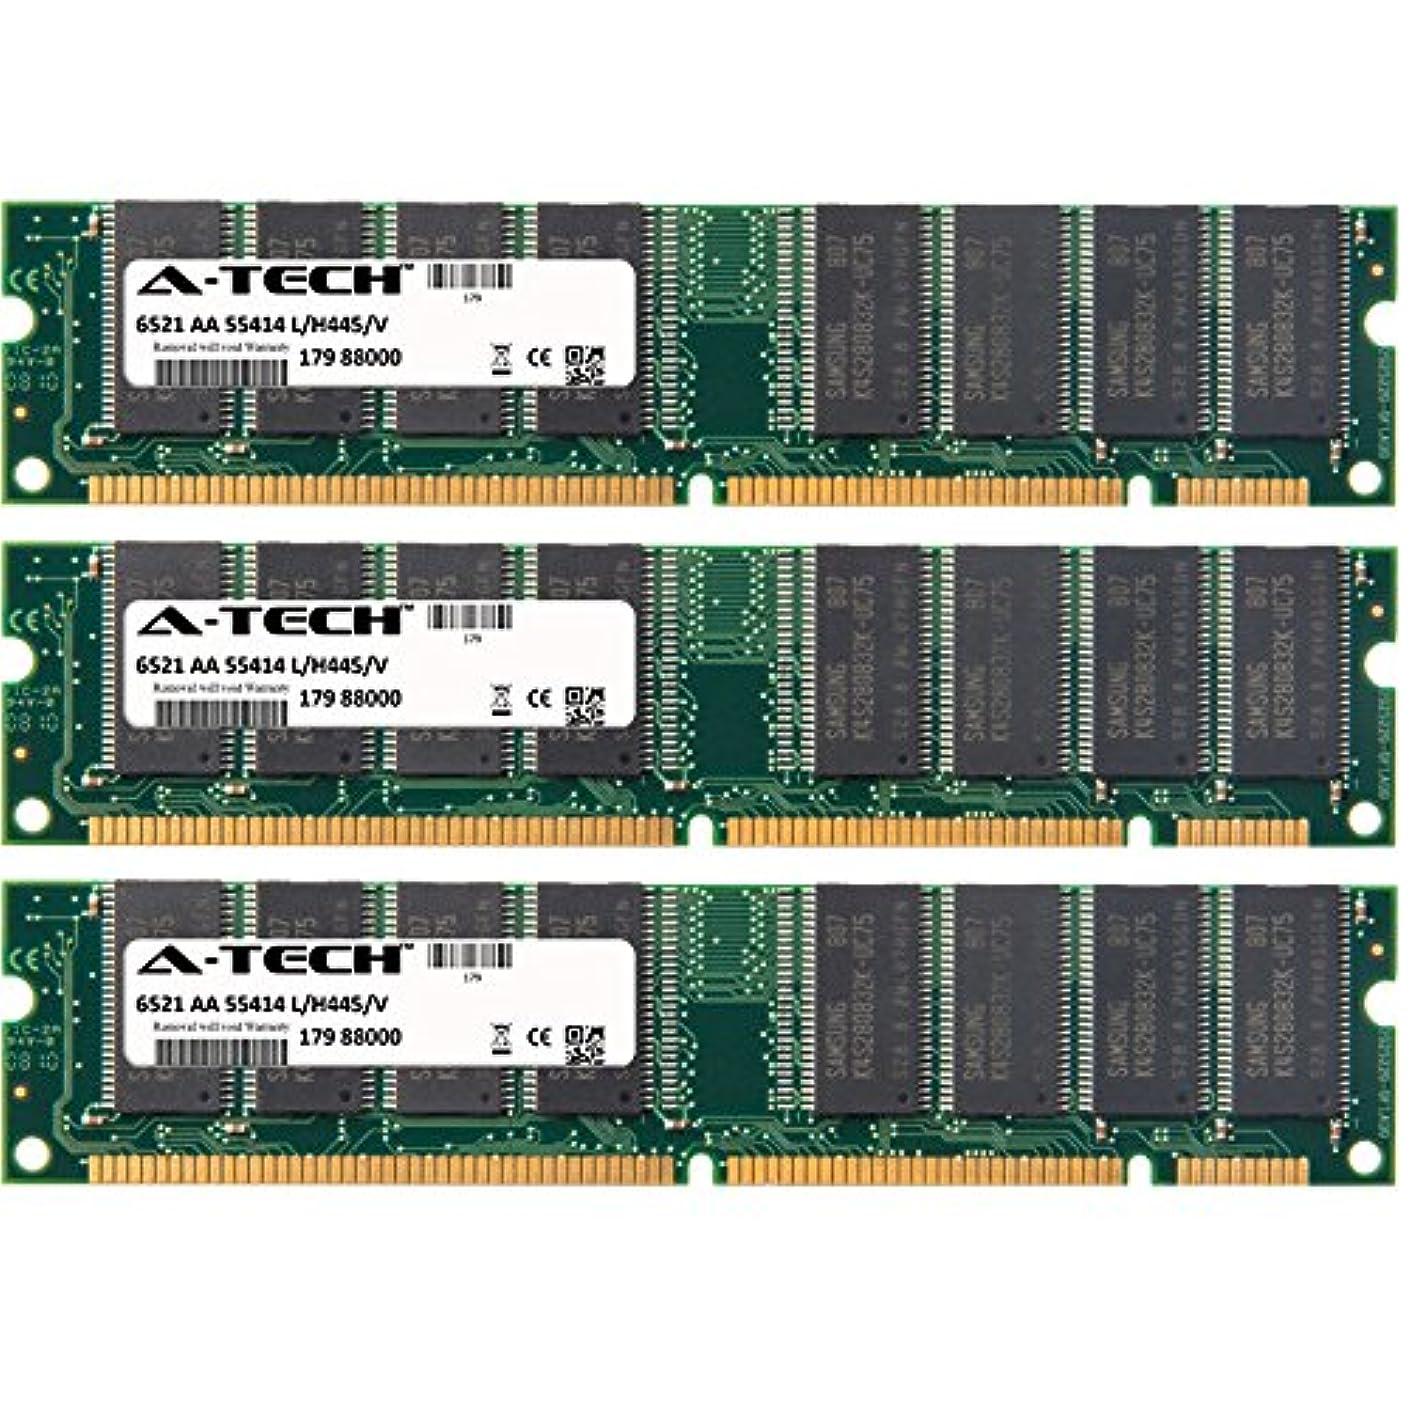 384MB KIT (3 x 128MB) for Gateway Essential Series 450 450 Deluxe 450CS 450CS Deluxe 450se 500 Deluxe 550 Deluxe. DIMM SD Non-ECC PC100 100MHz RAM Memory. Genuine A-Tech Brand.